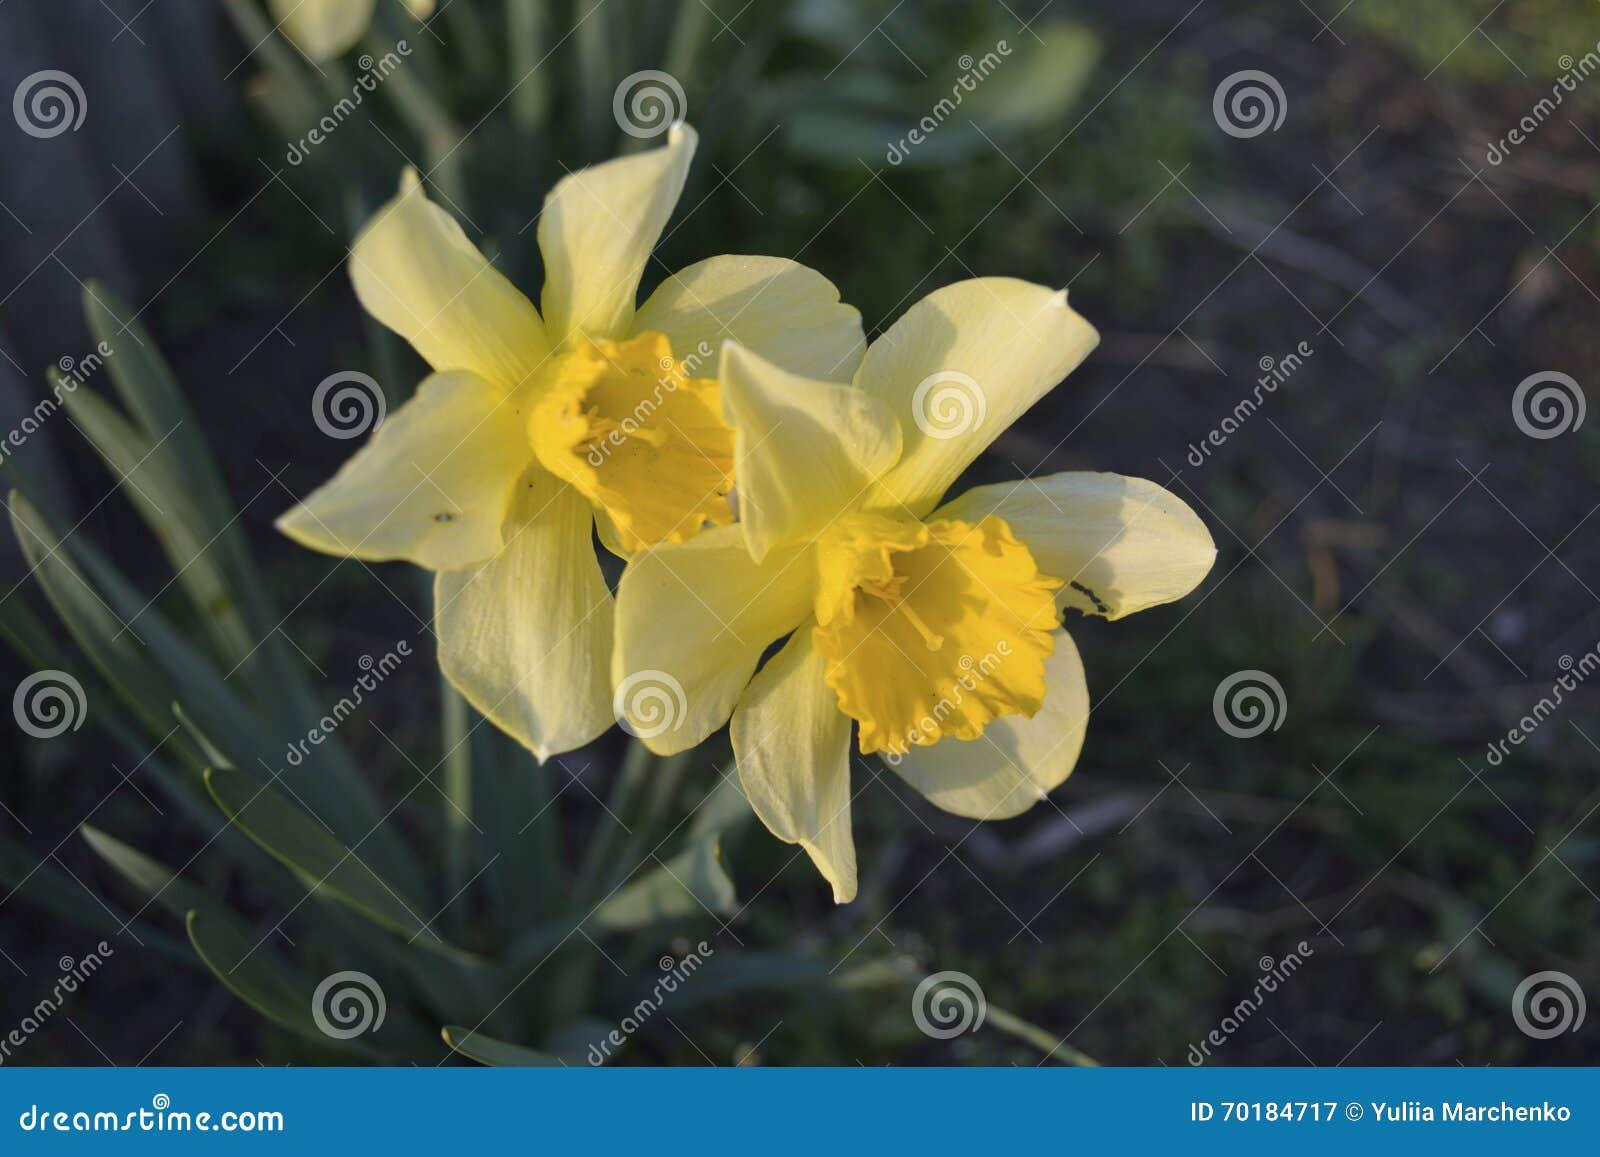 Blomsterrabatt av gula påskliljor